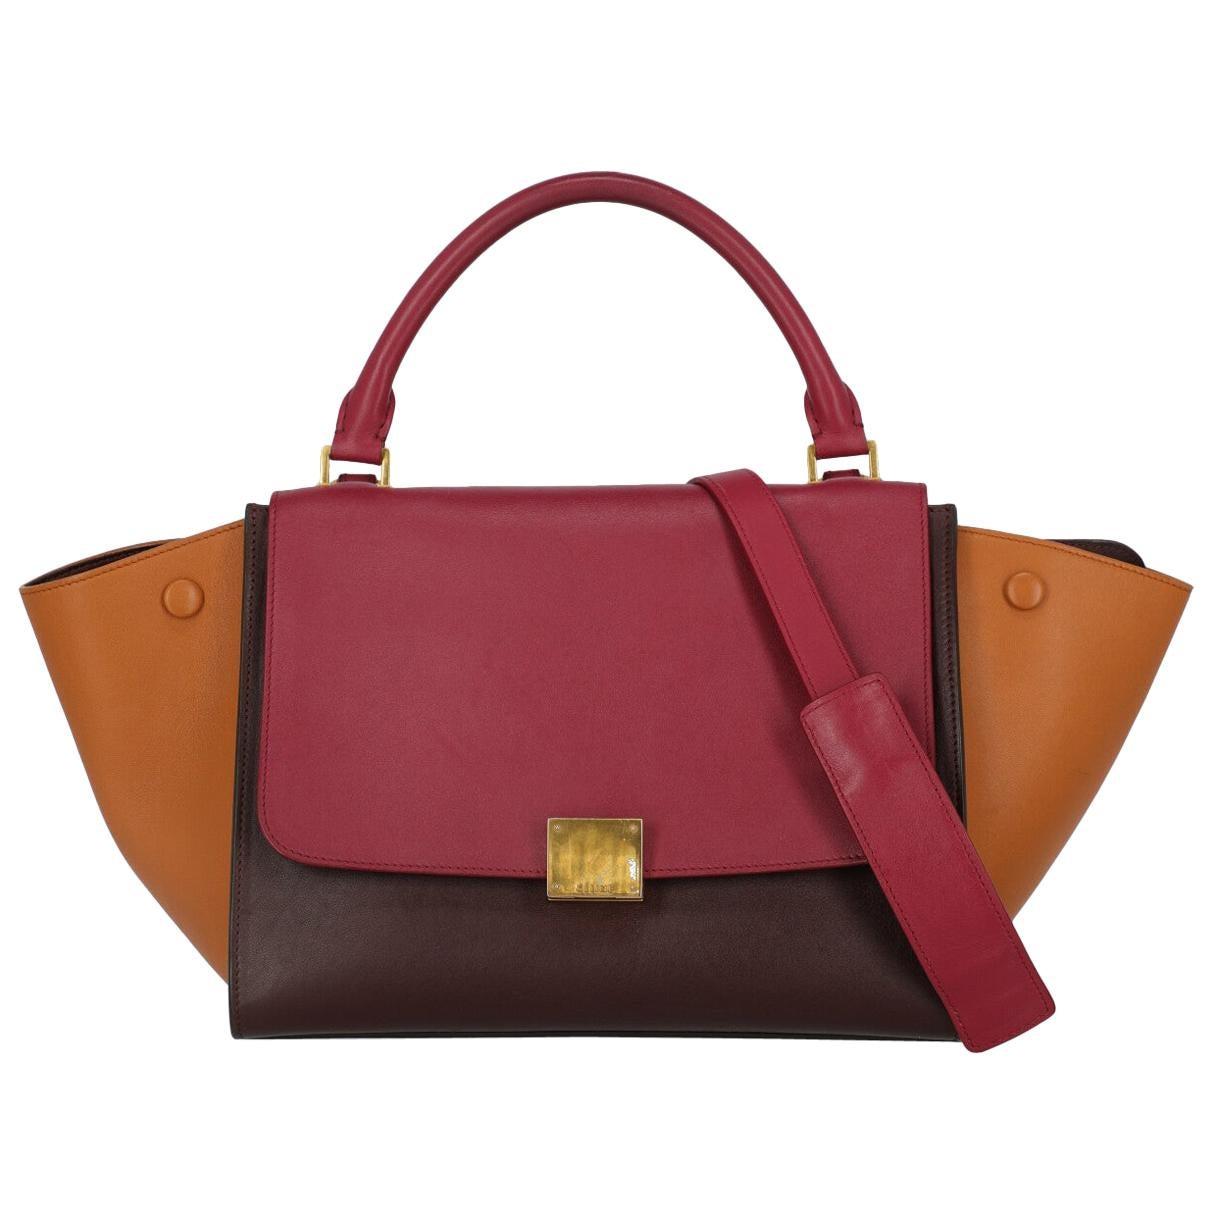 Celine Women's Handbag Trapeze Brown/Burgundy/Red Leather